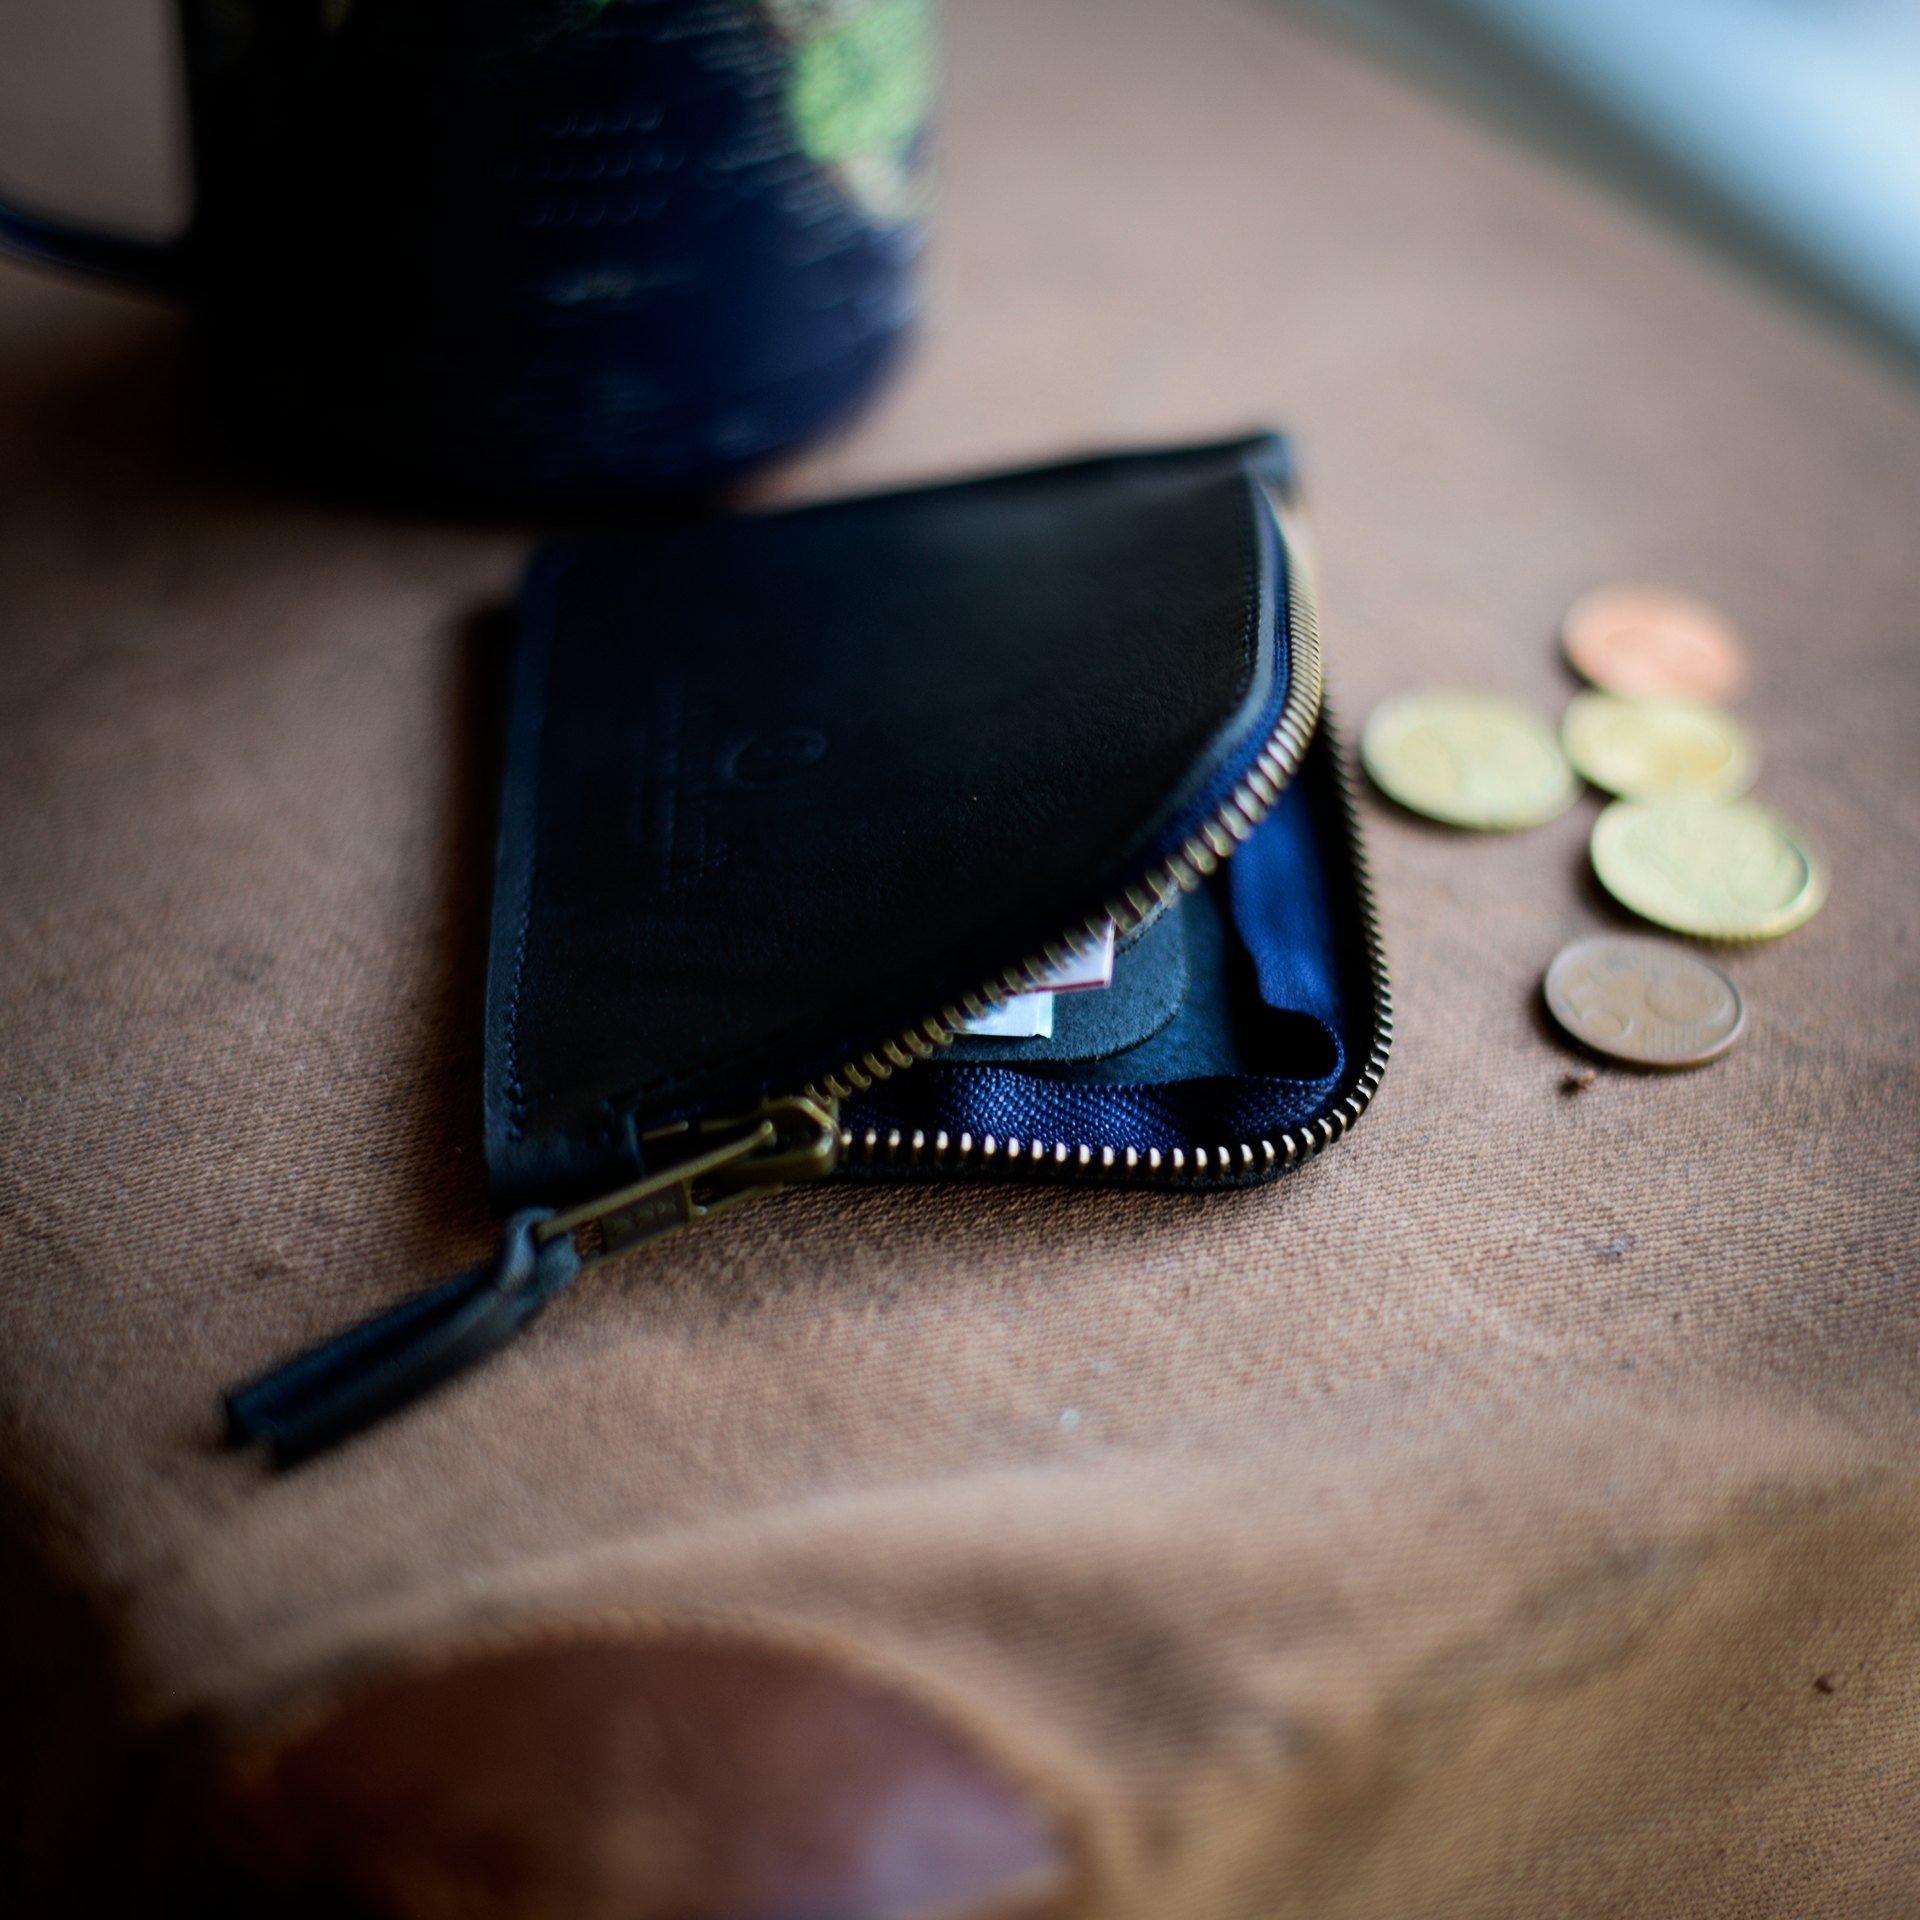 Porte monnaie zippé As / M - Noir (image n°5)